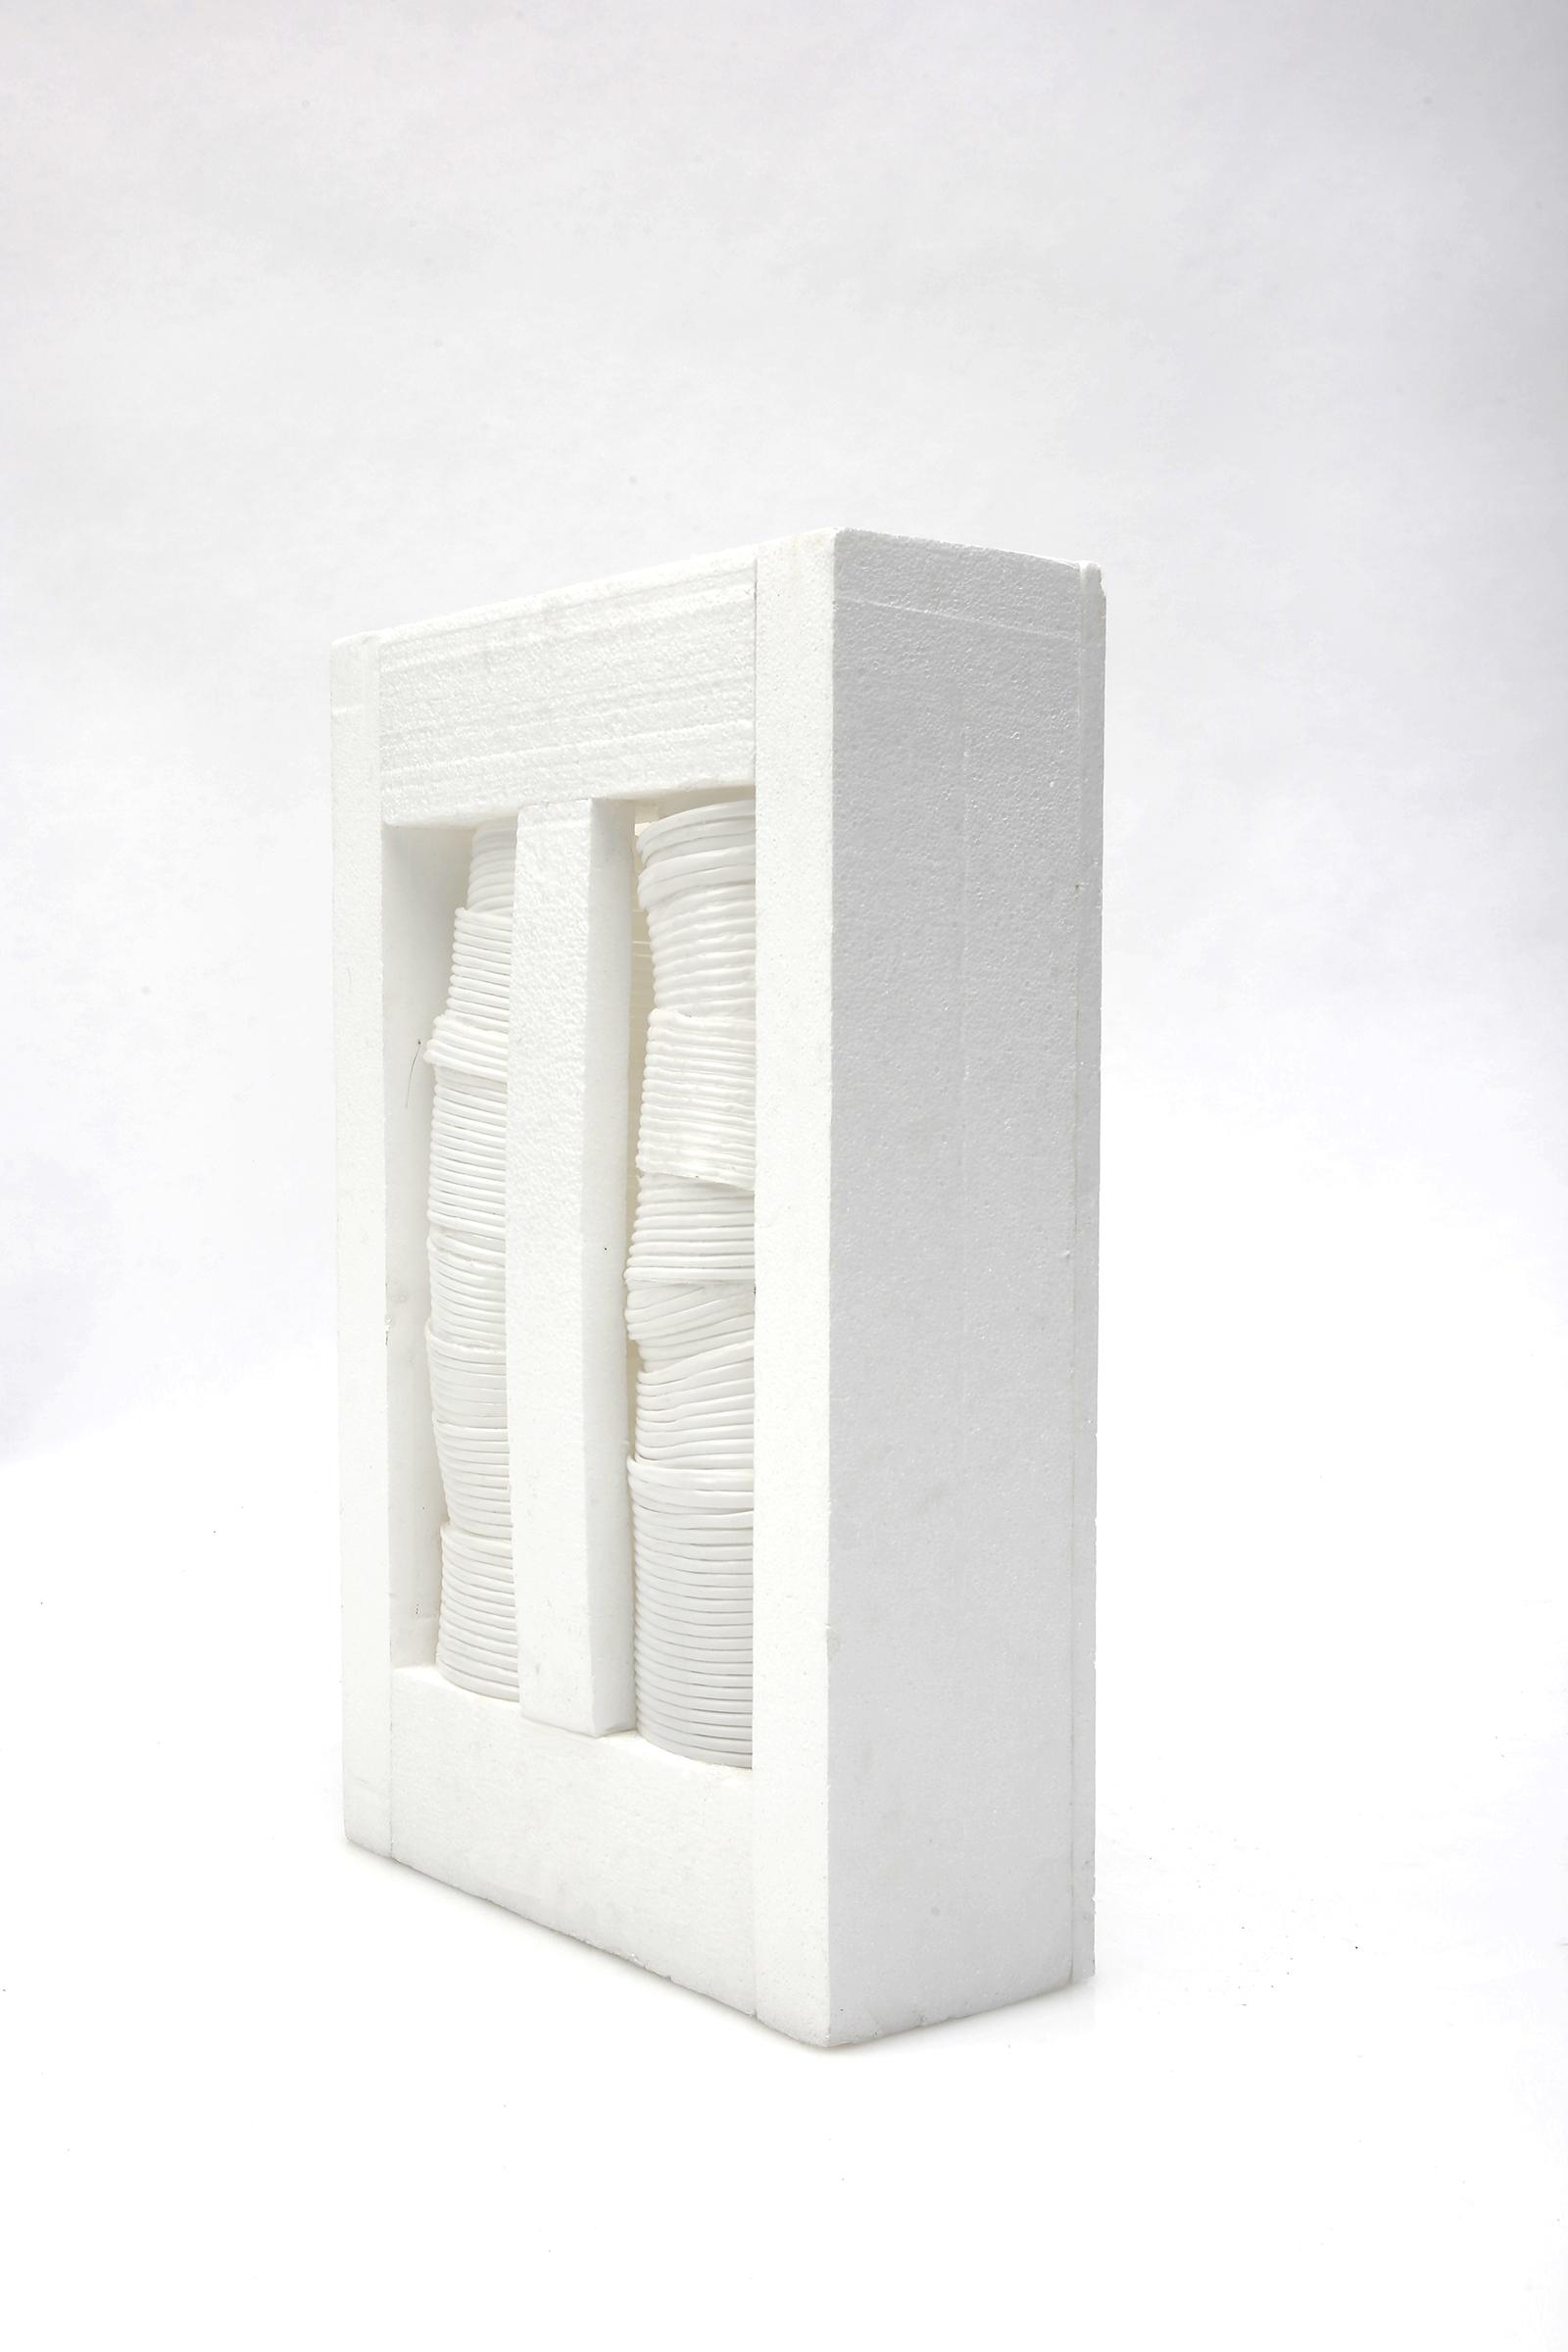 Window (off), 2018, Plastic straws, Styrofoam